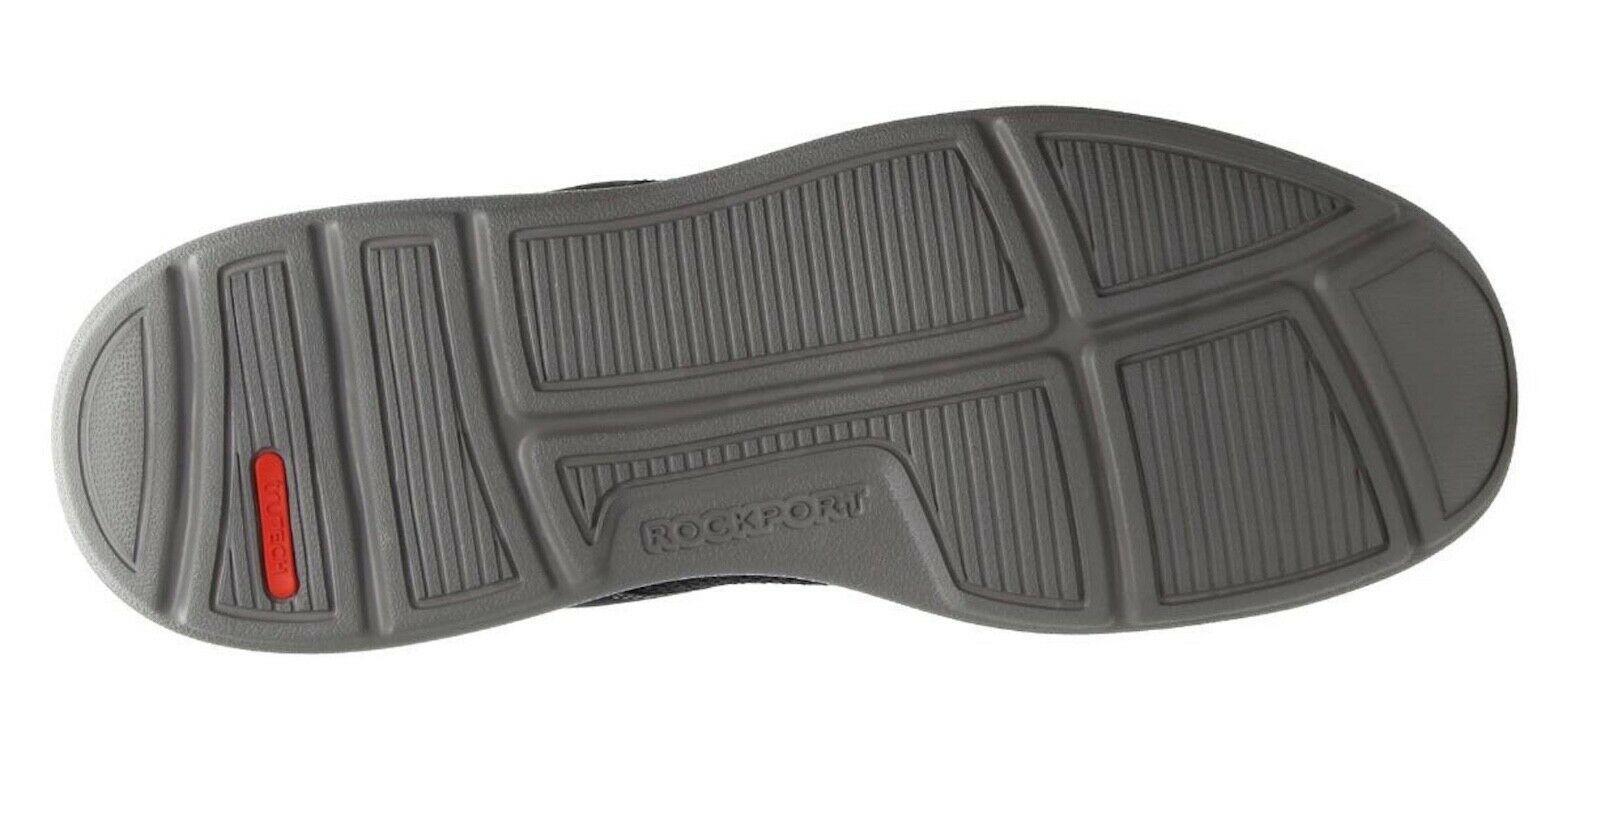 Mens Rockport Zaden Plain Toe Oxfords - Navy Nubuck Mesh Size 9 [CH4927]